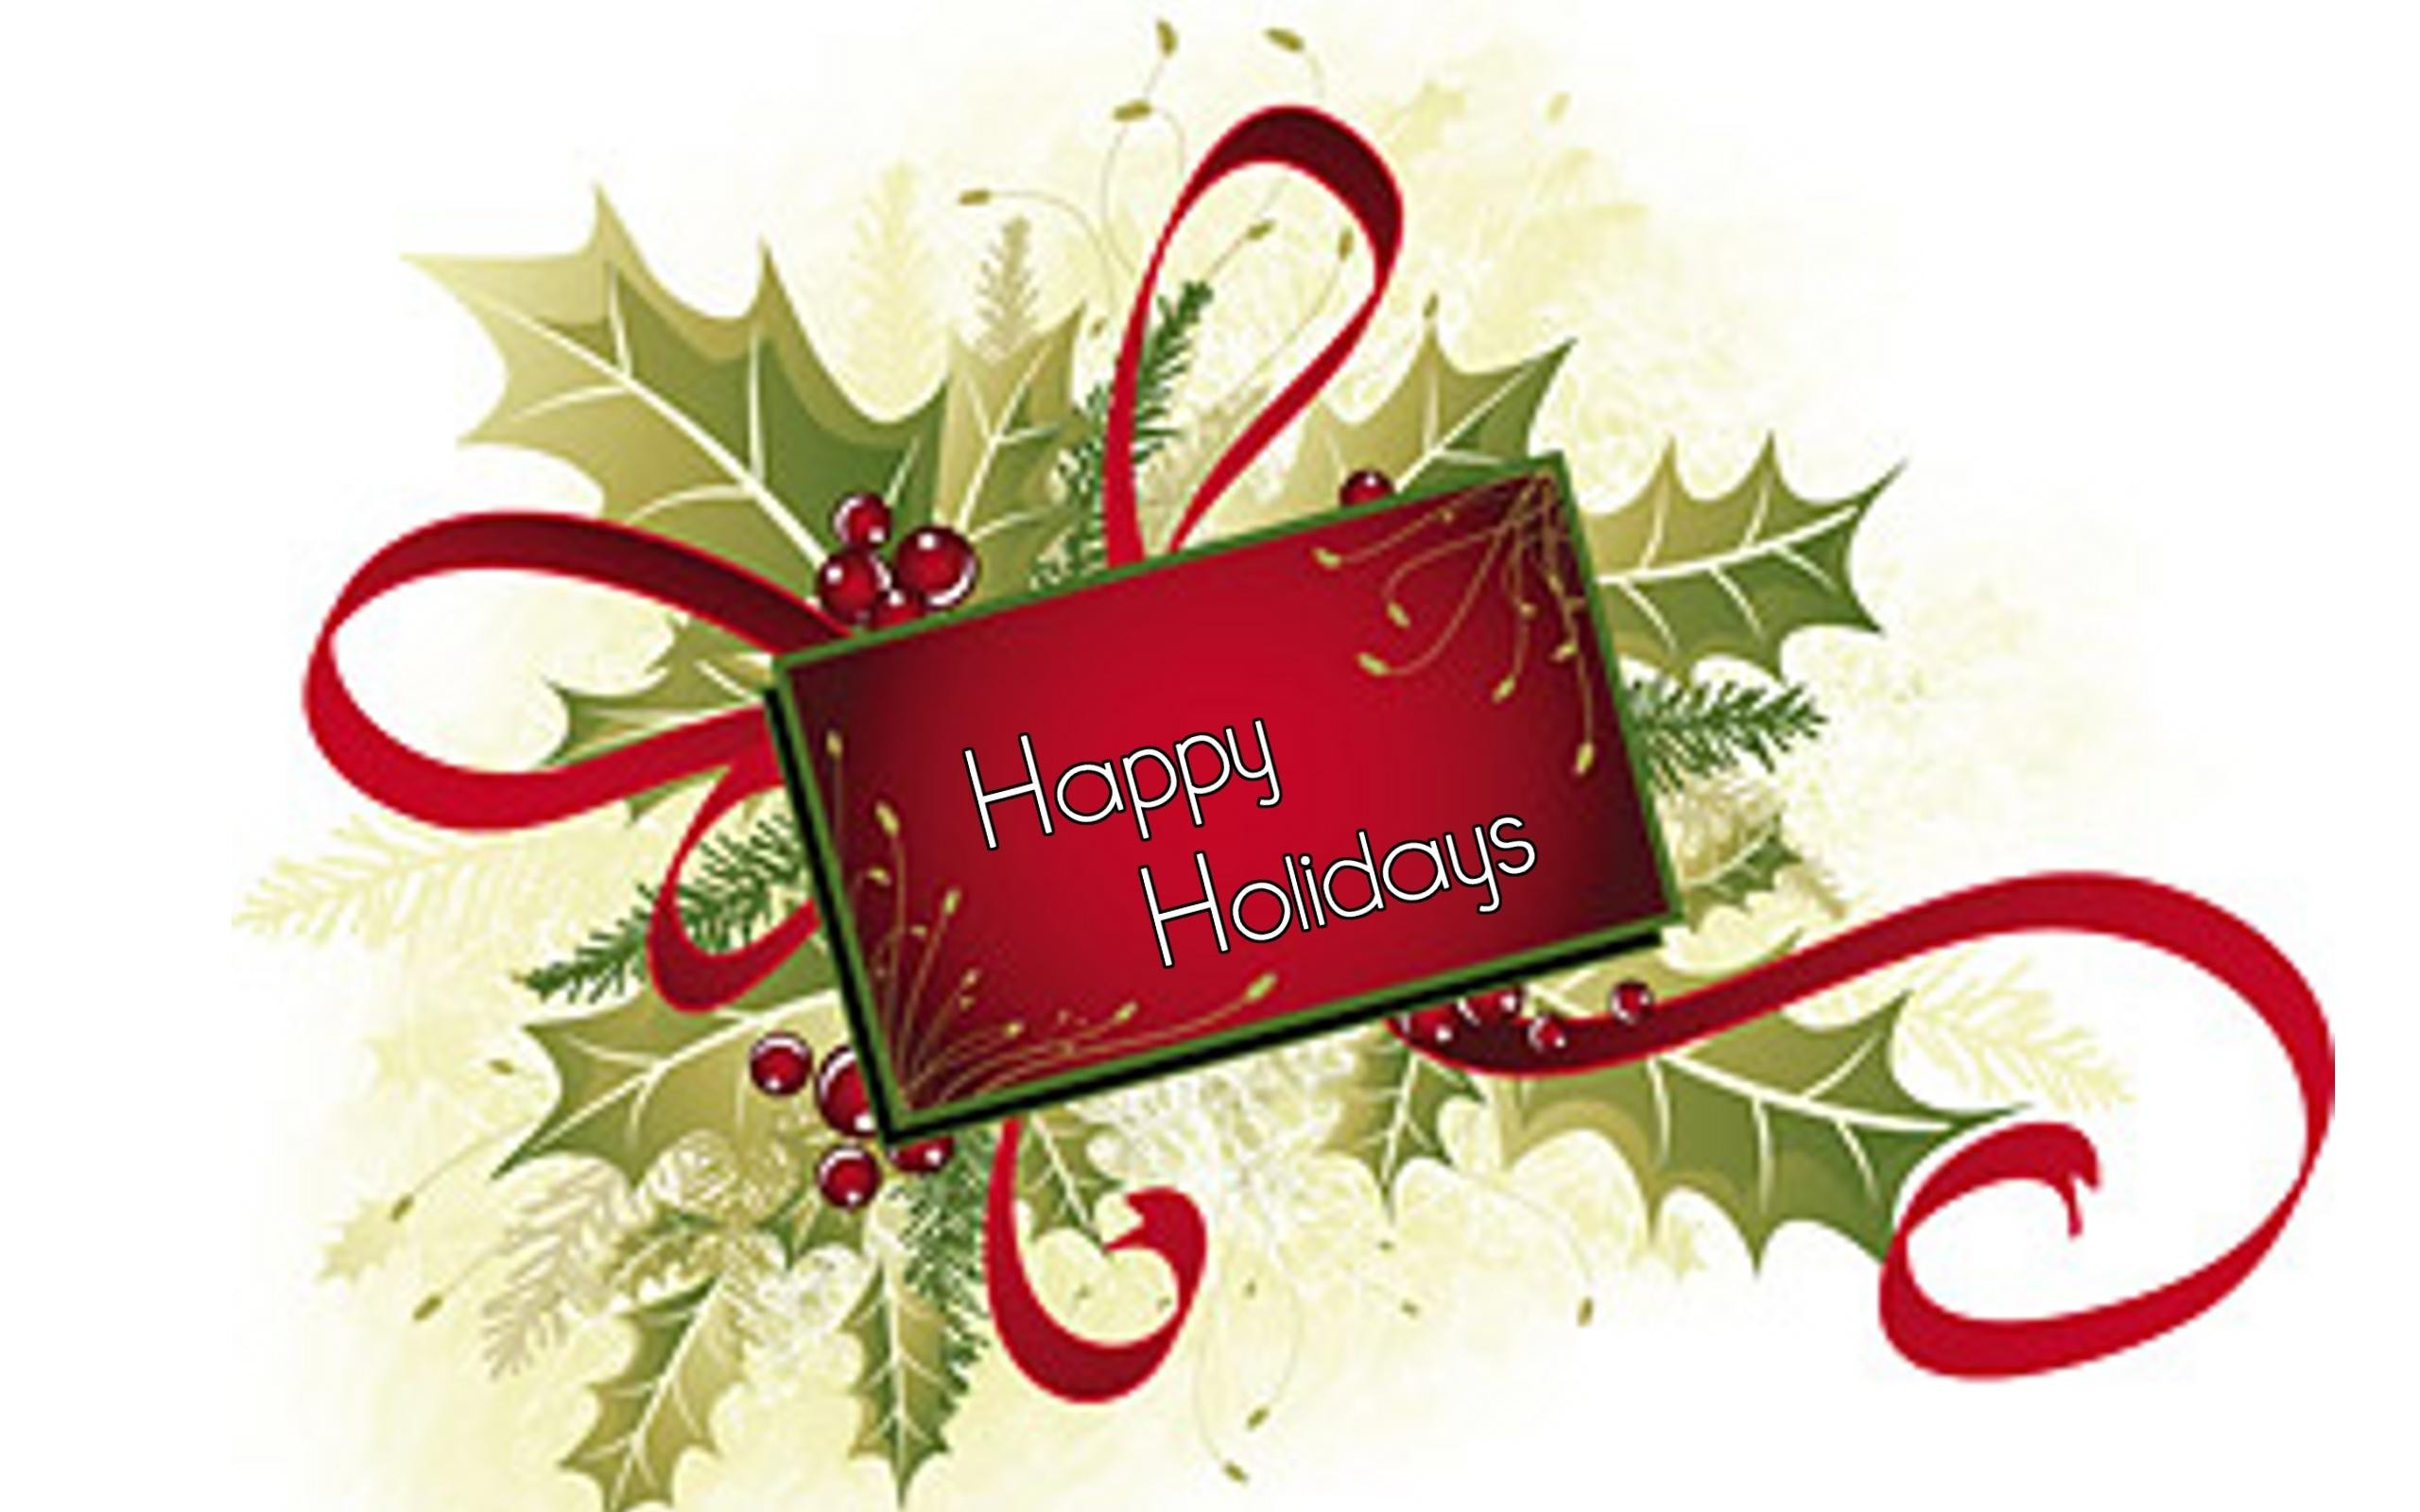 Happy Holiday Wallpaper Full Screen High Definition Desktop 2560x1600